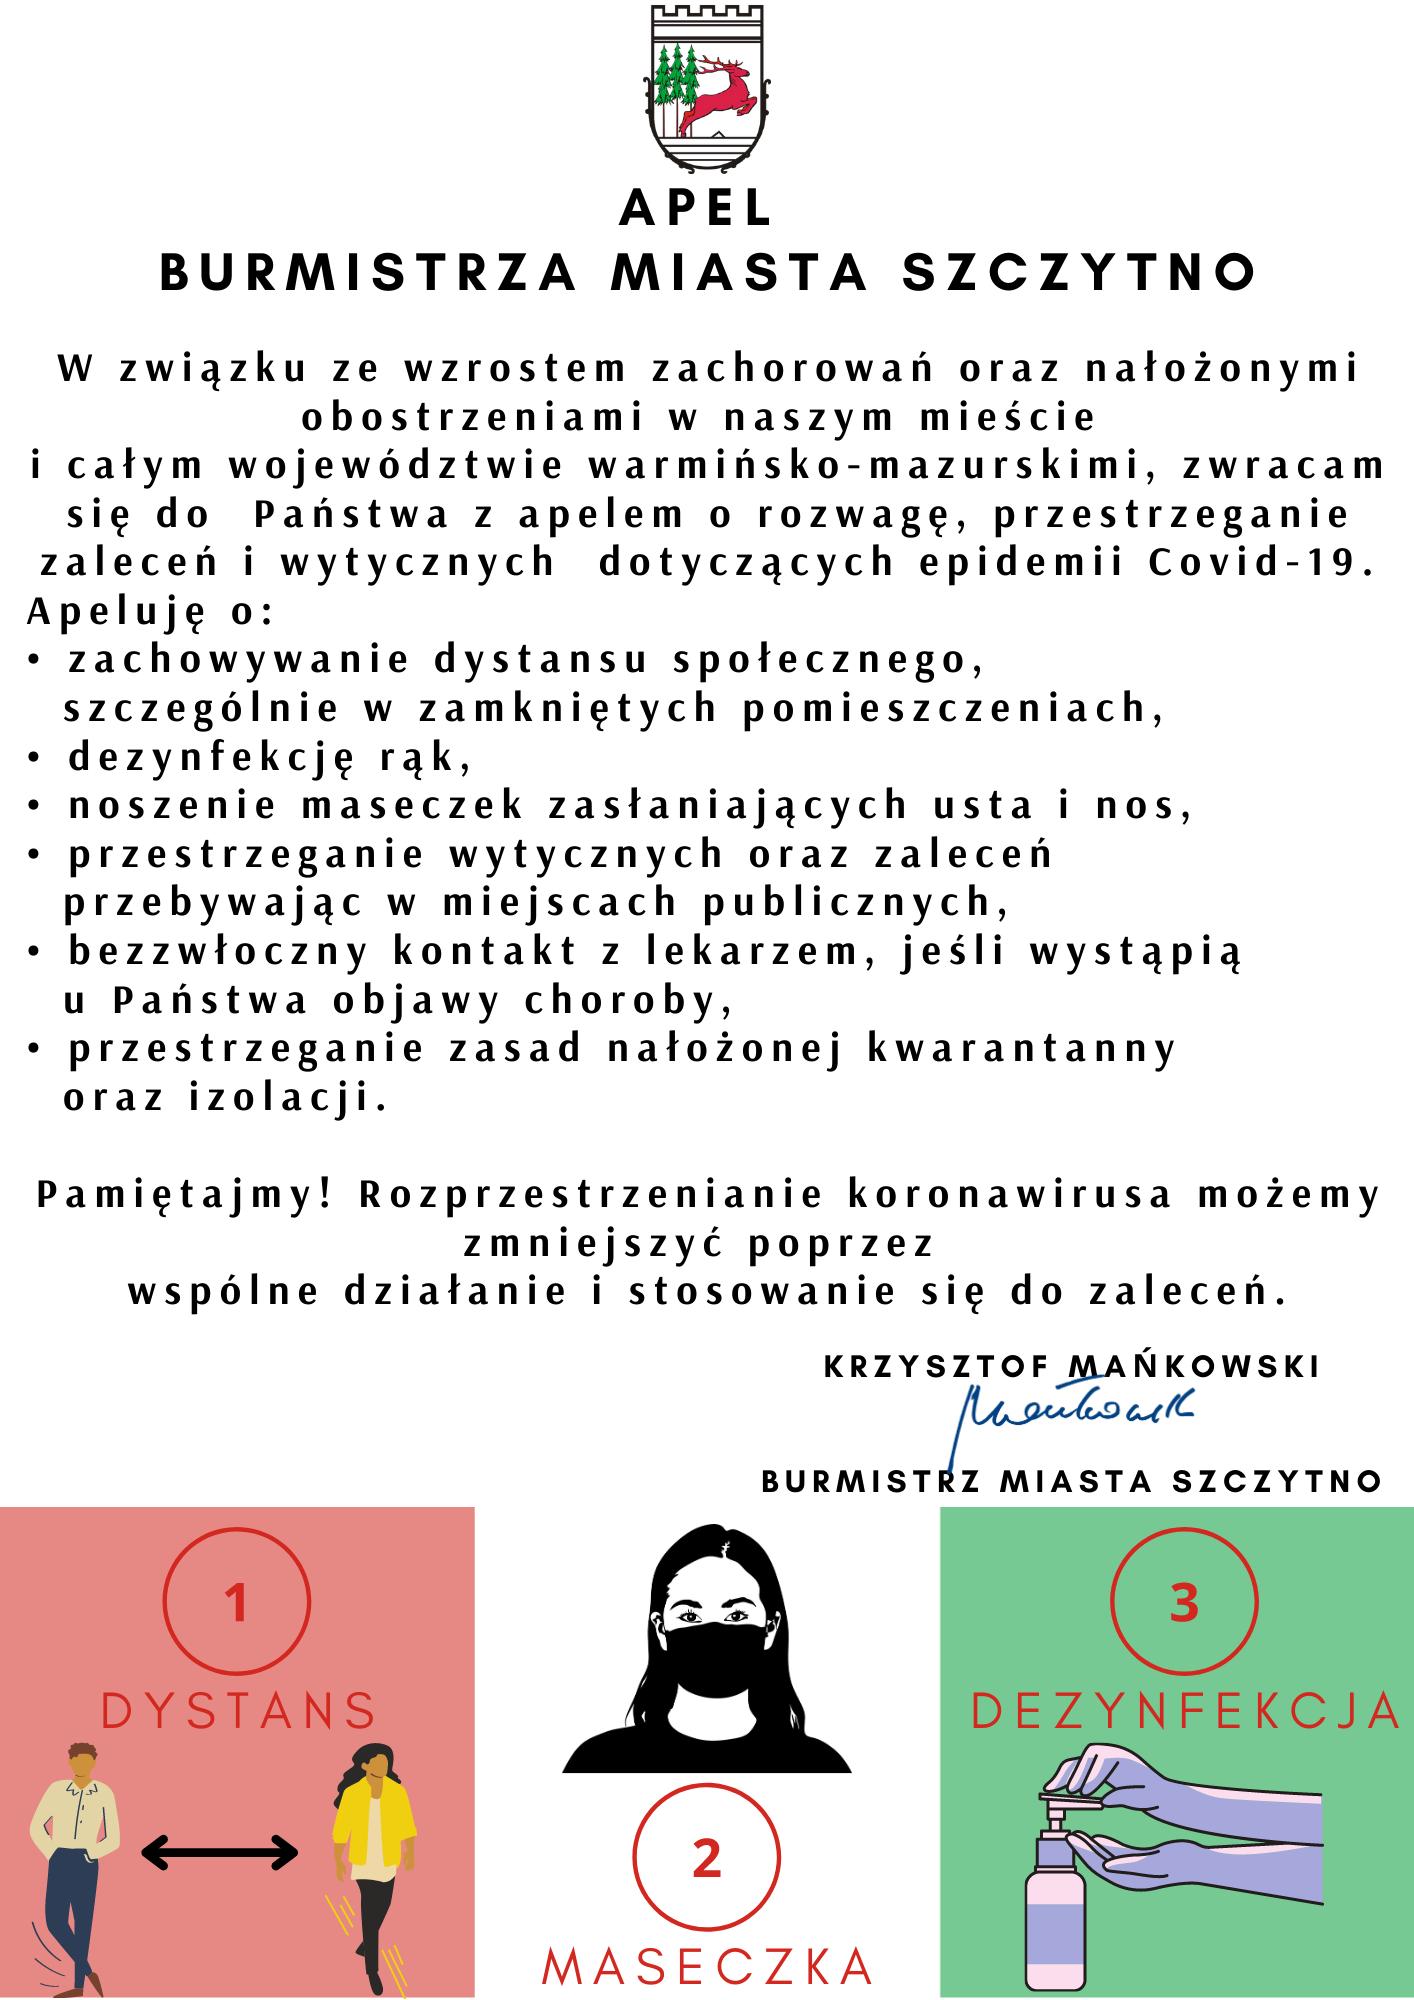 https://m.powiatszczycienski.pl/2021/02/orig/maintain-physical-distancing-38358.png